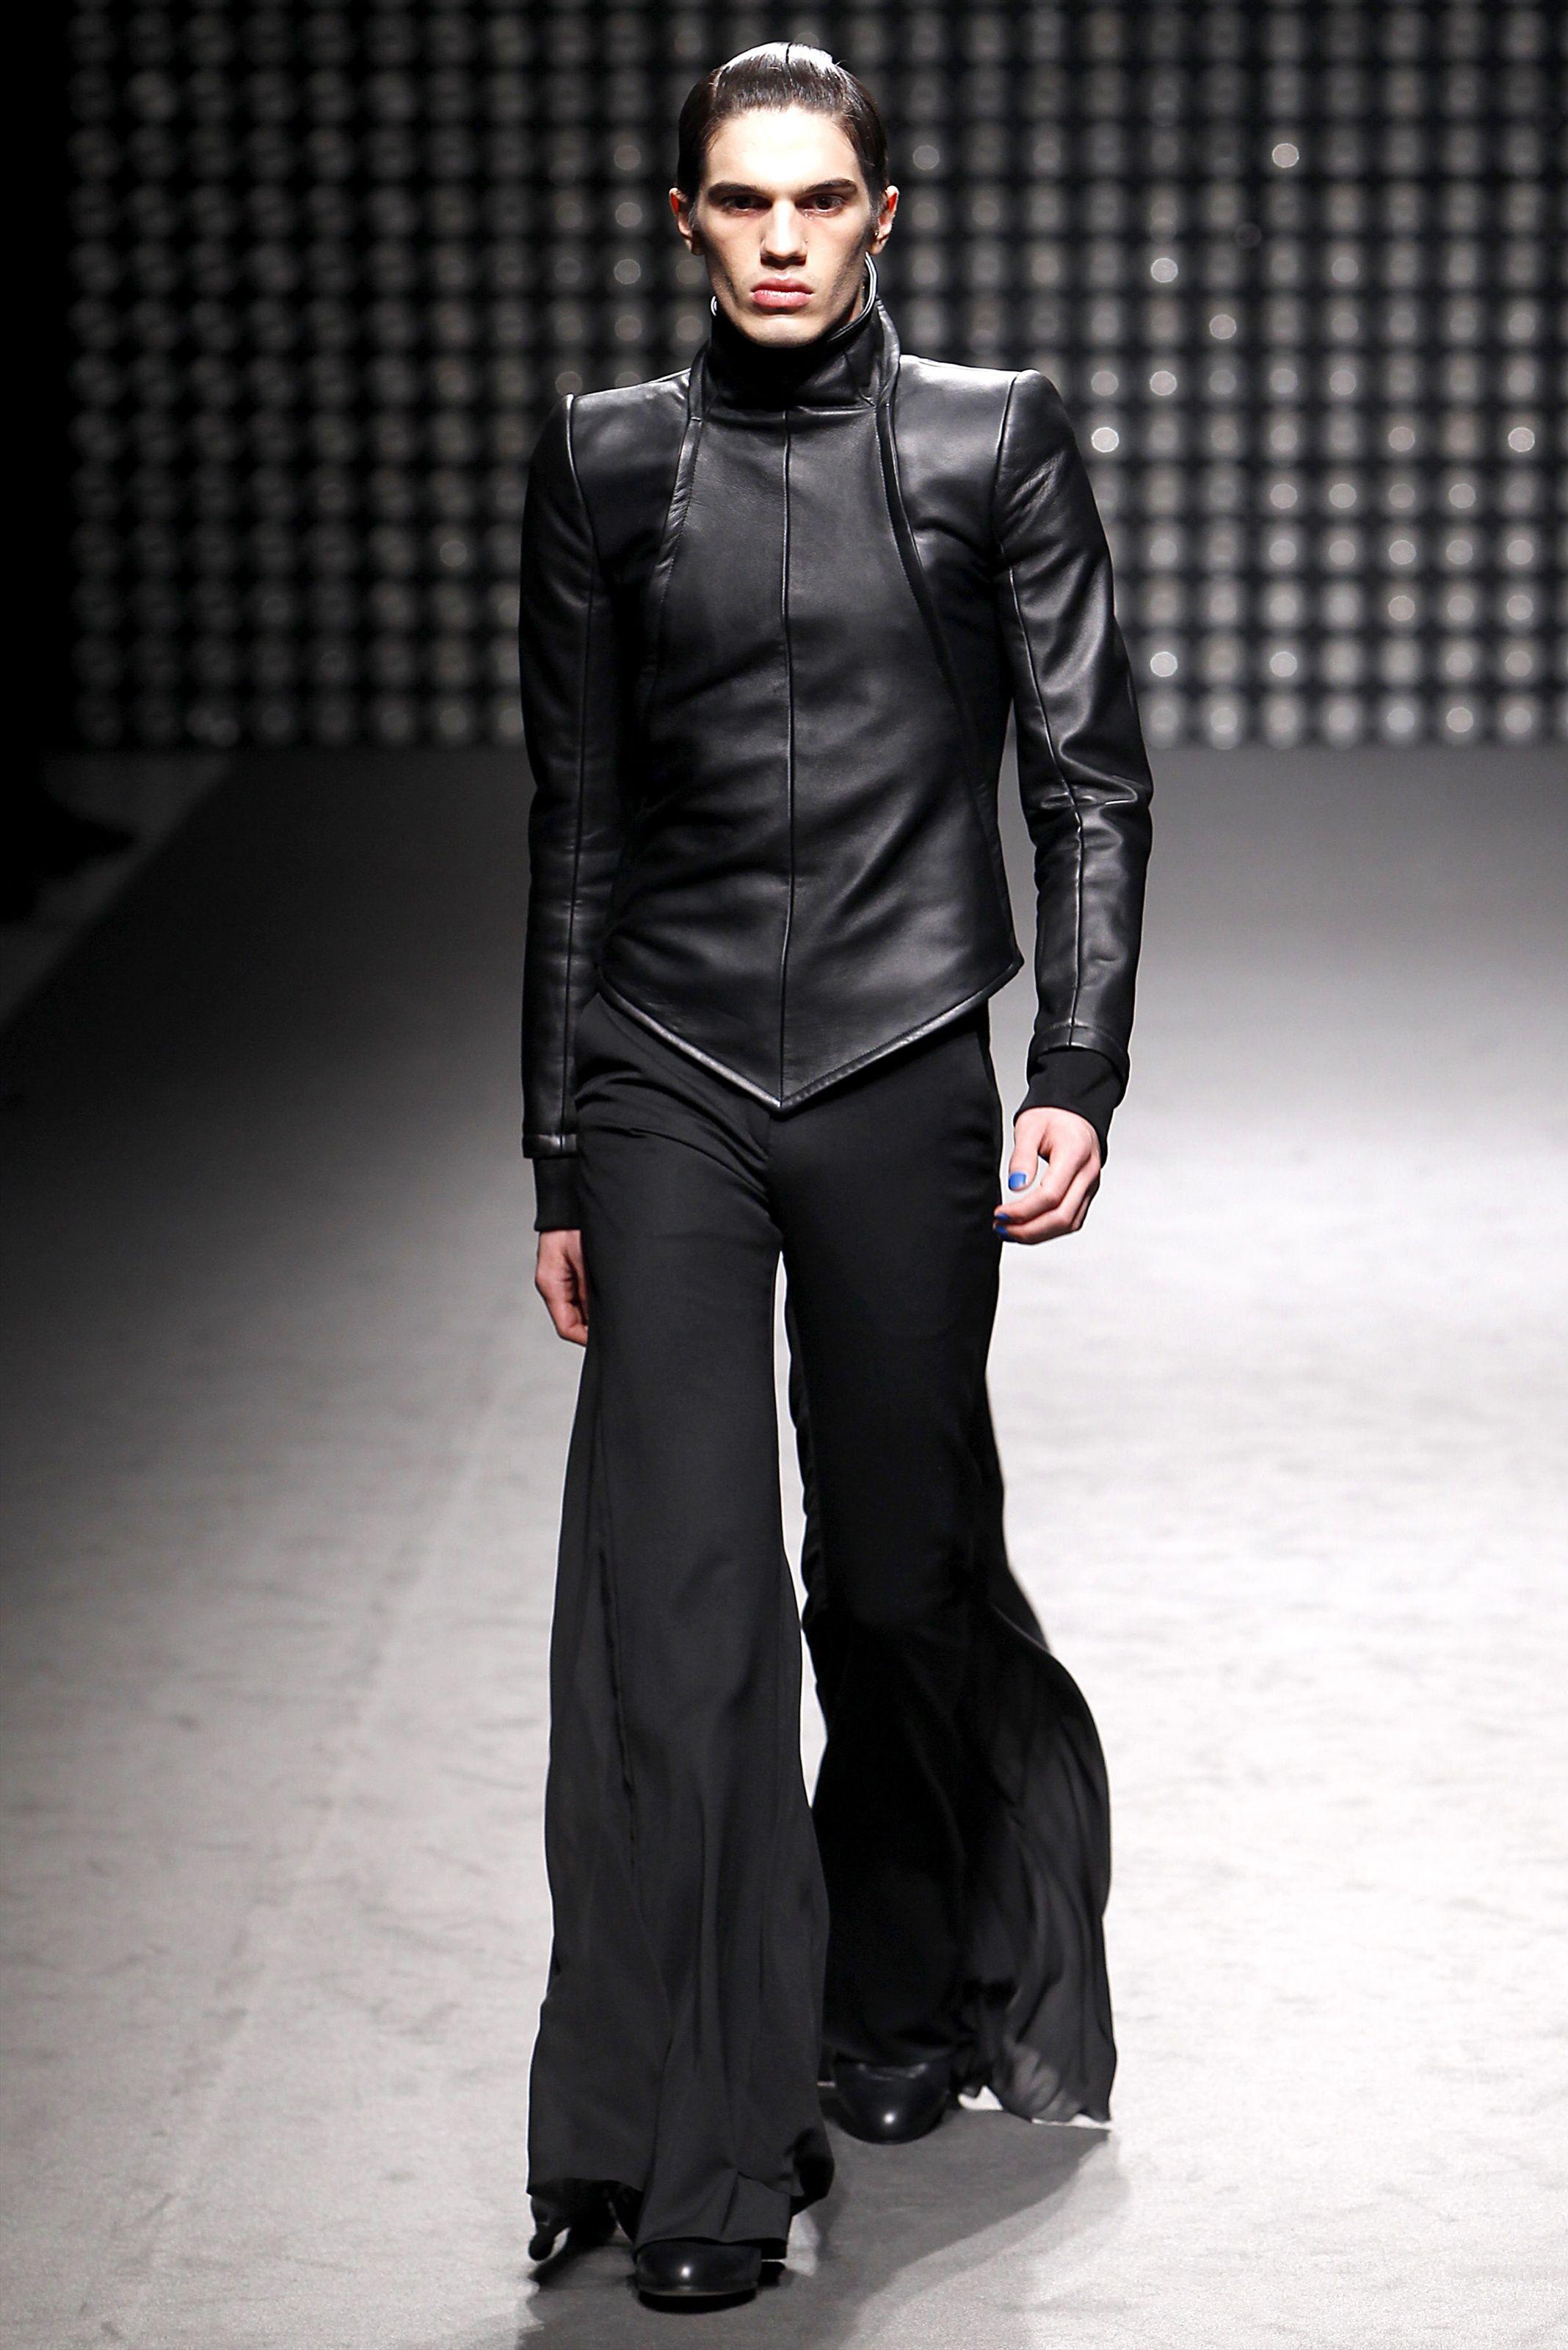 Waterland rosie compares sydney fashion blogger, Girls gilmore returning screens